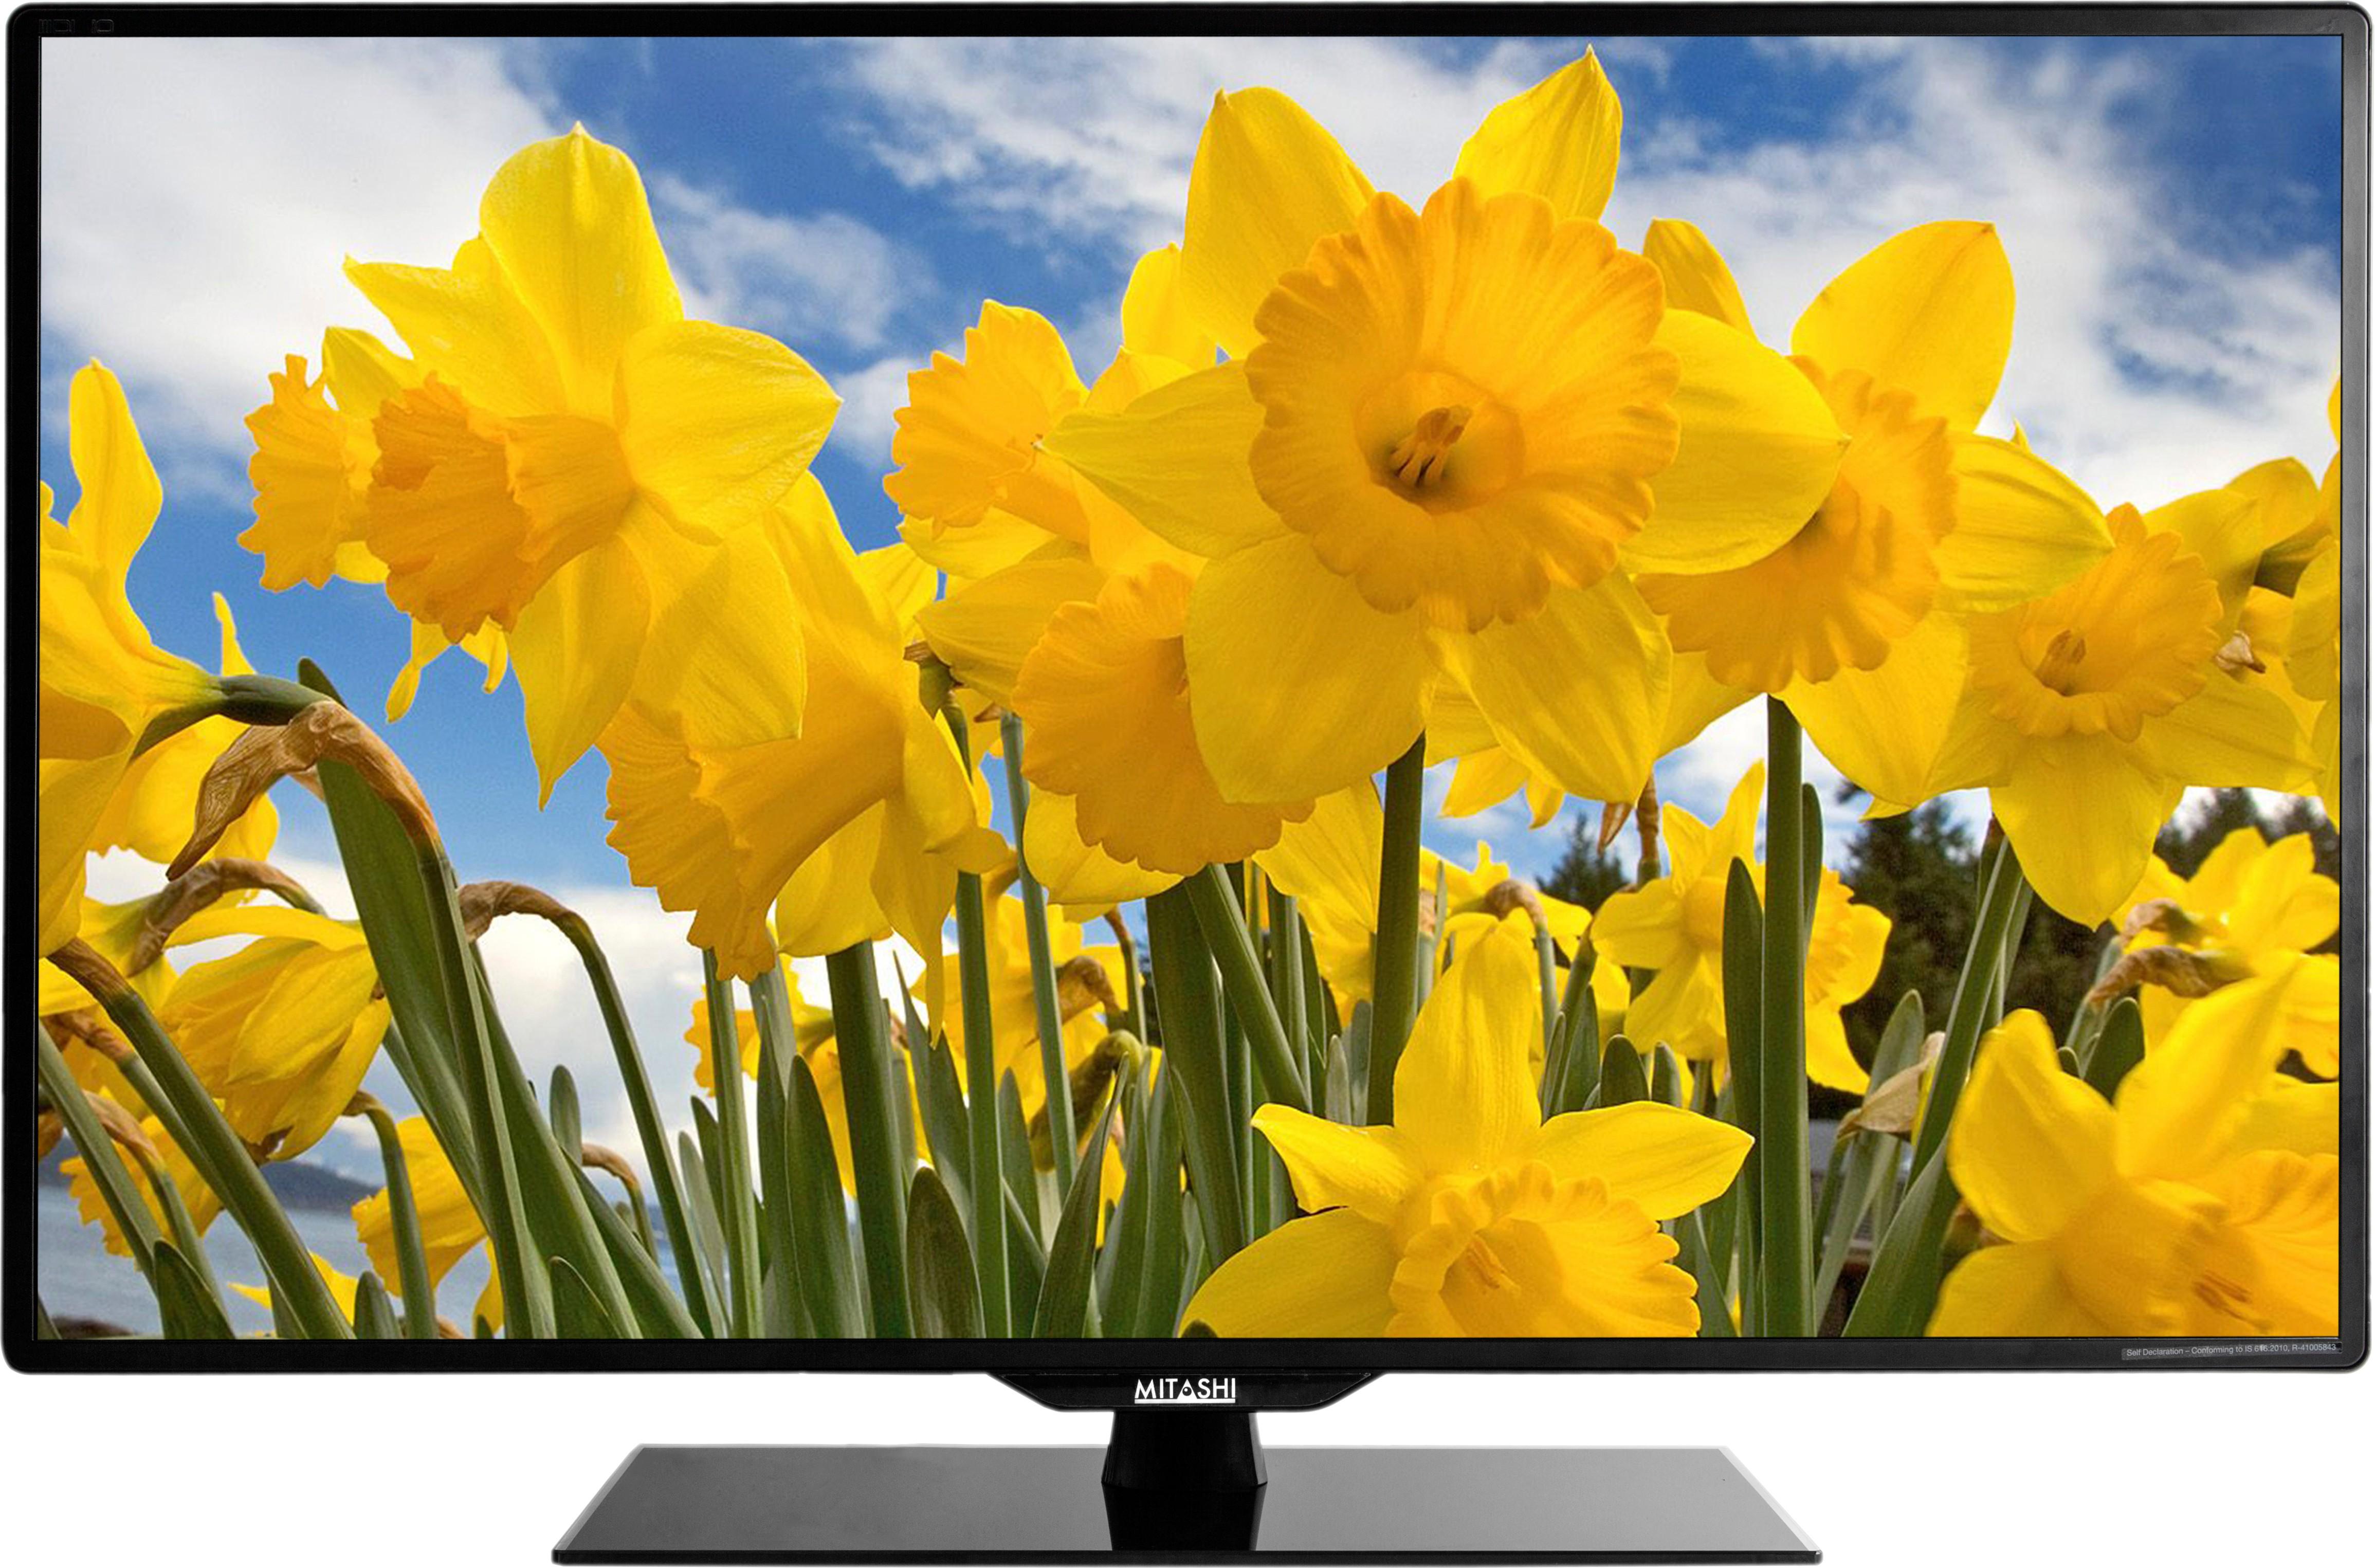 MITASHI MIDE040V10 40 Inches Full HD LED TV